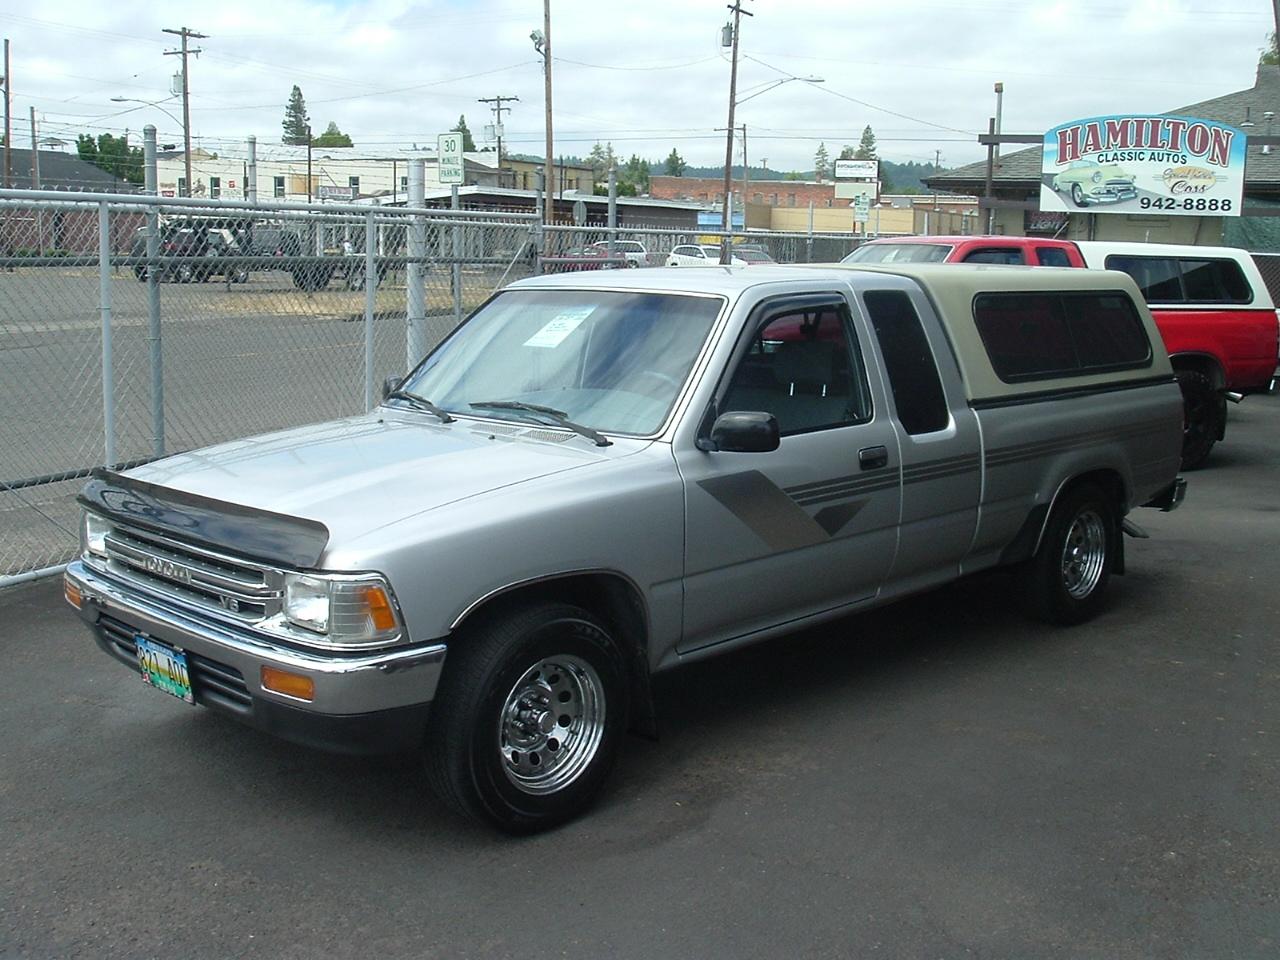 Specializing in Classic Cars & Trucks